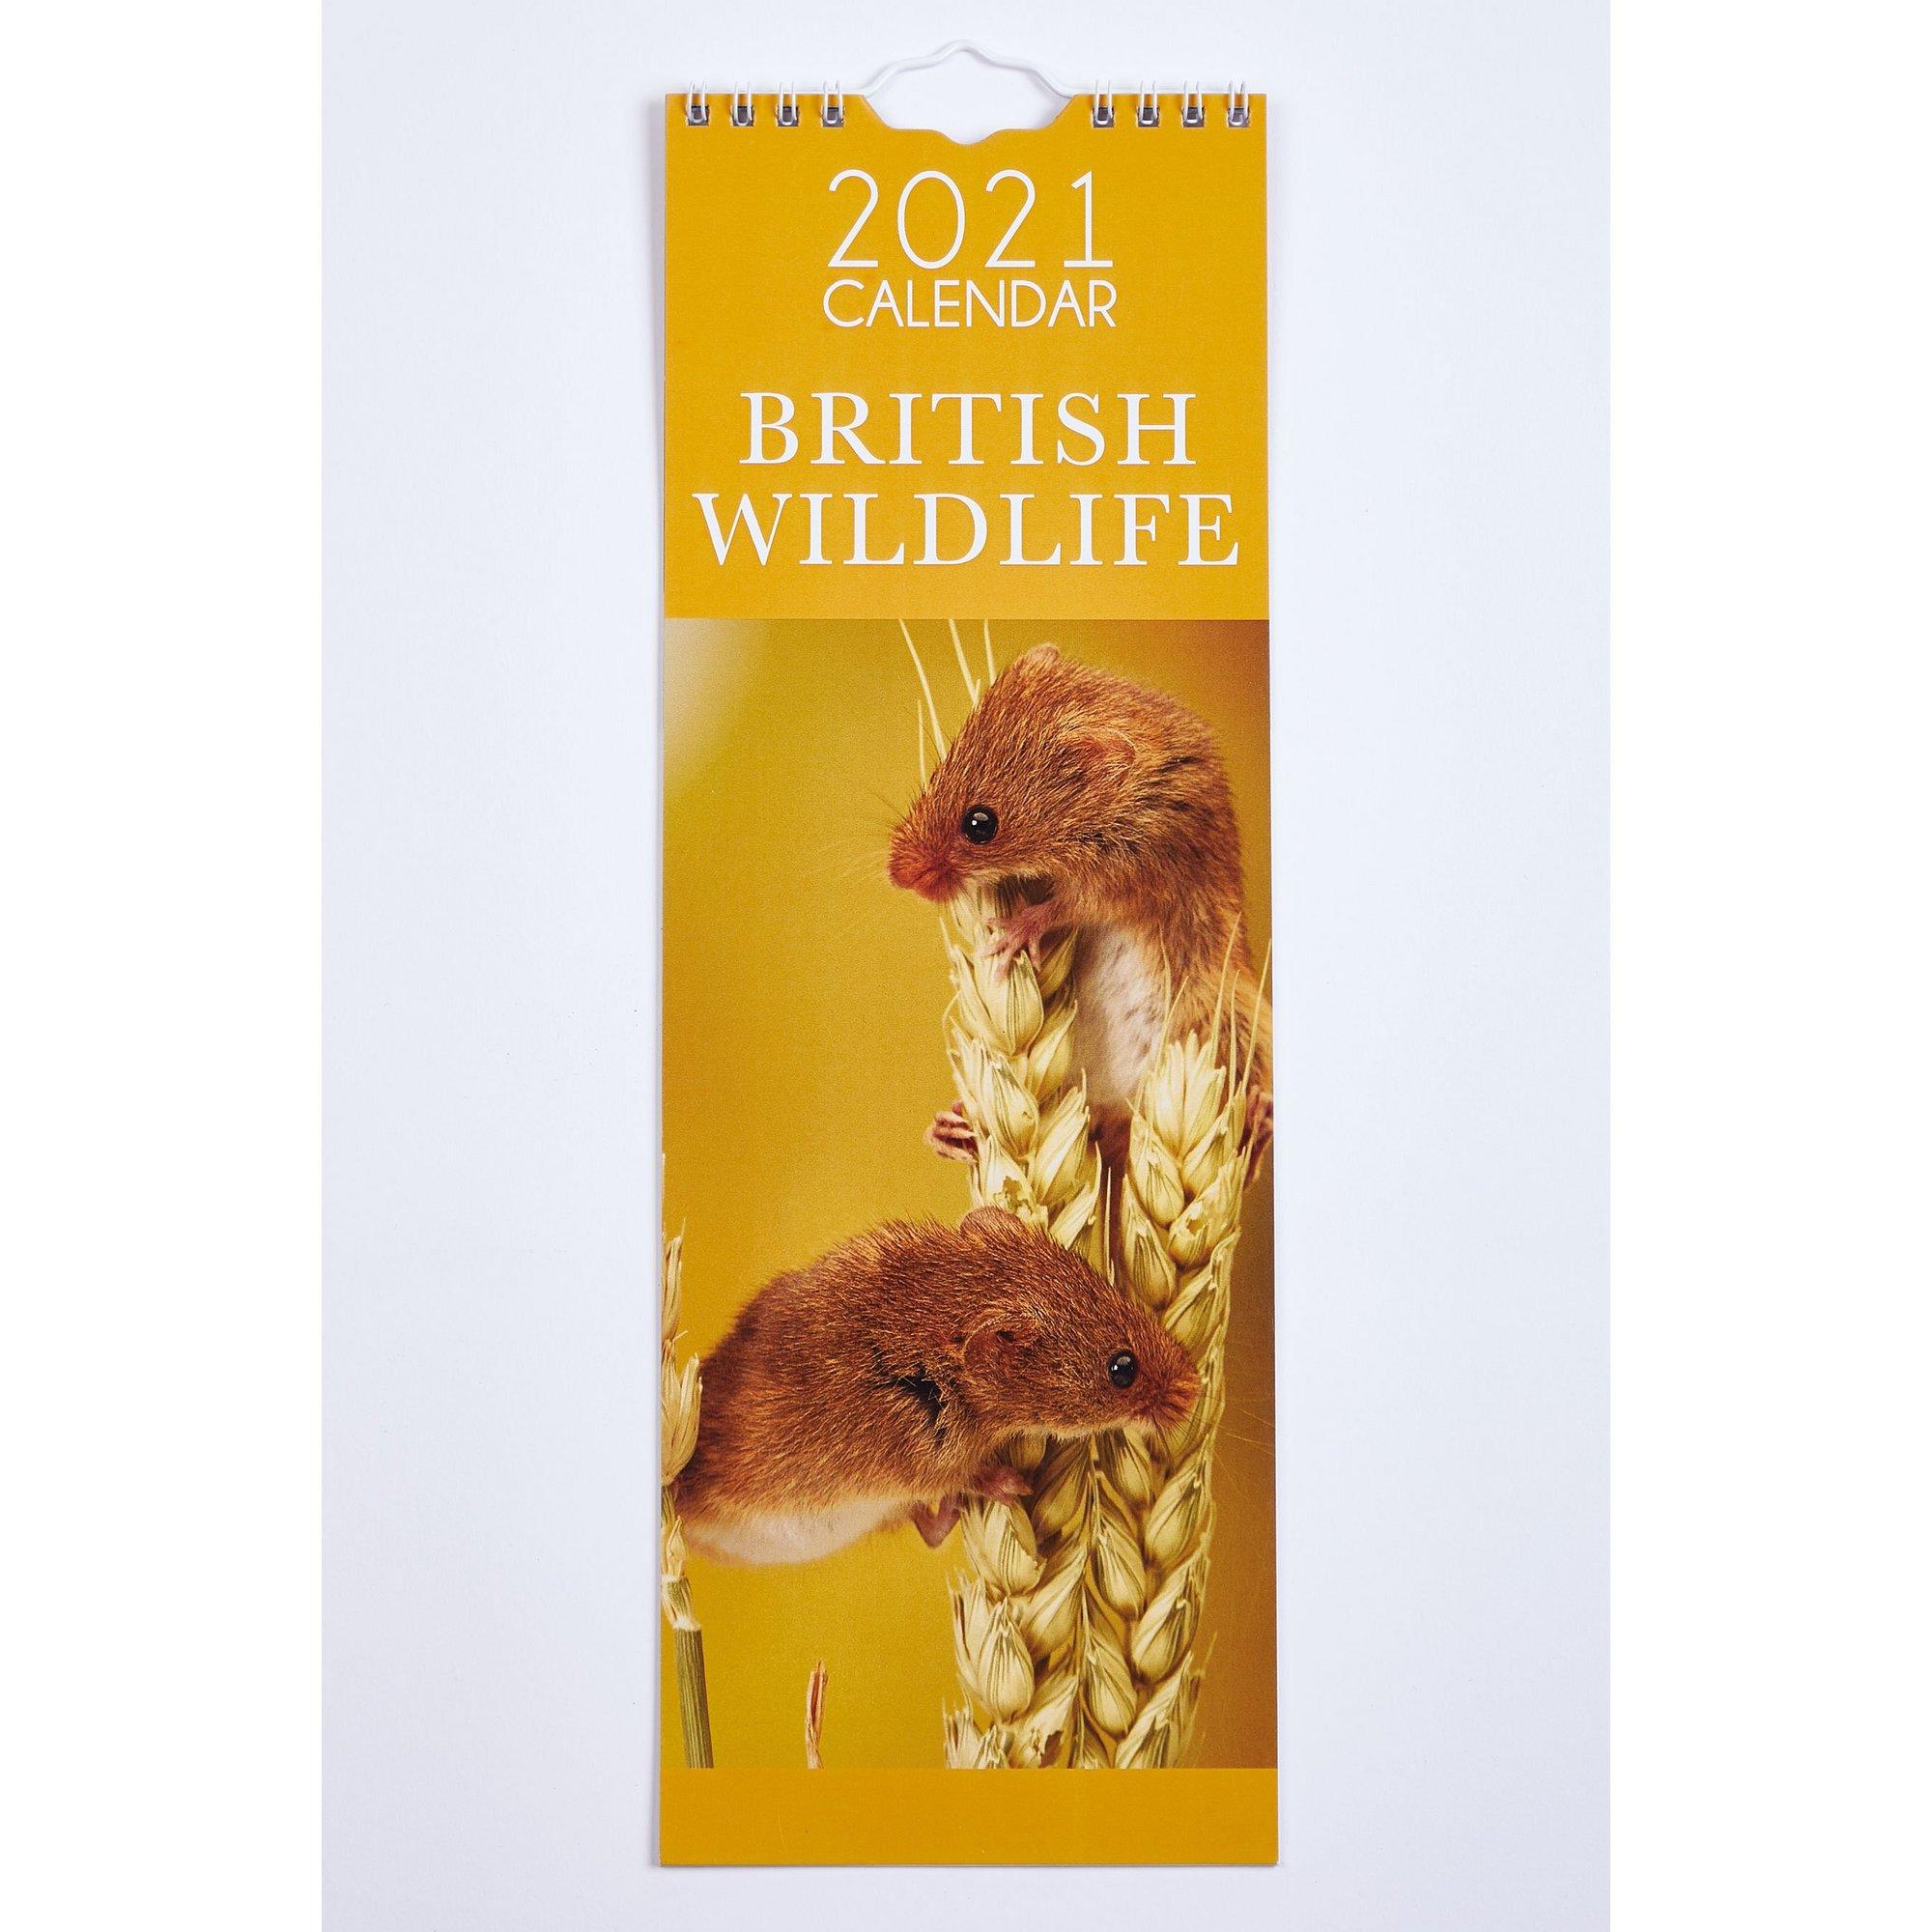 Image of Slim British Wildlife Calendar 2021